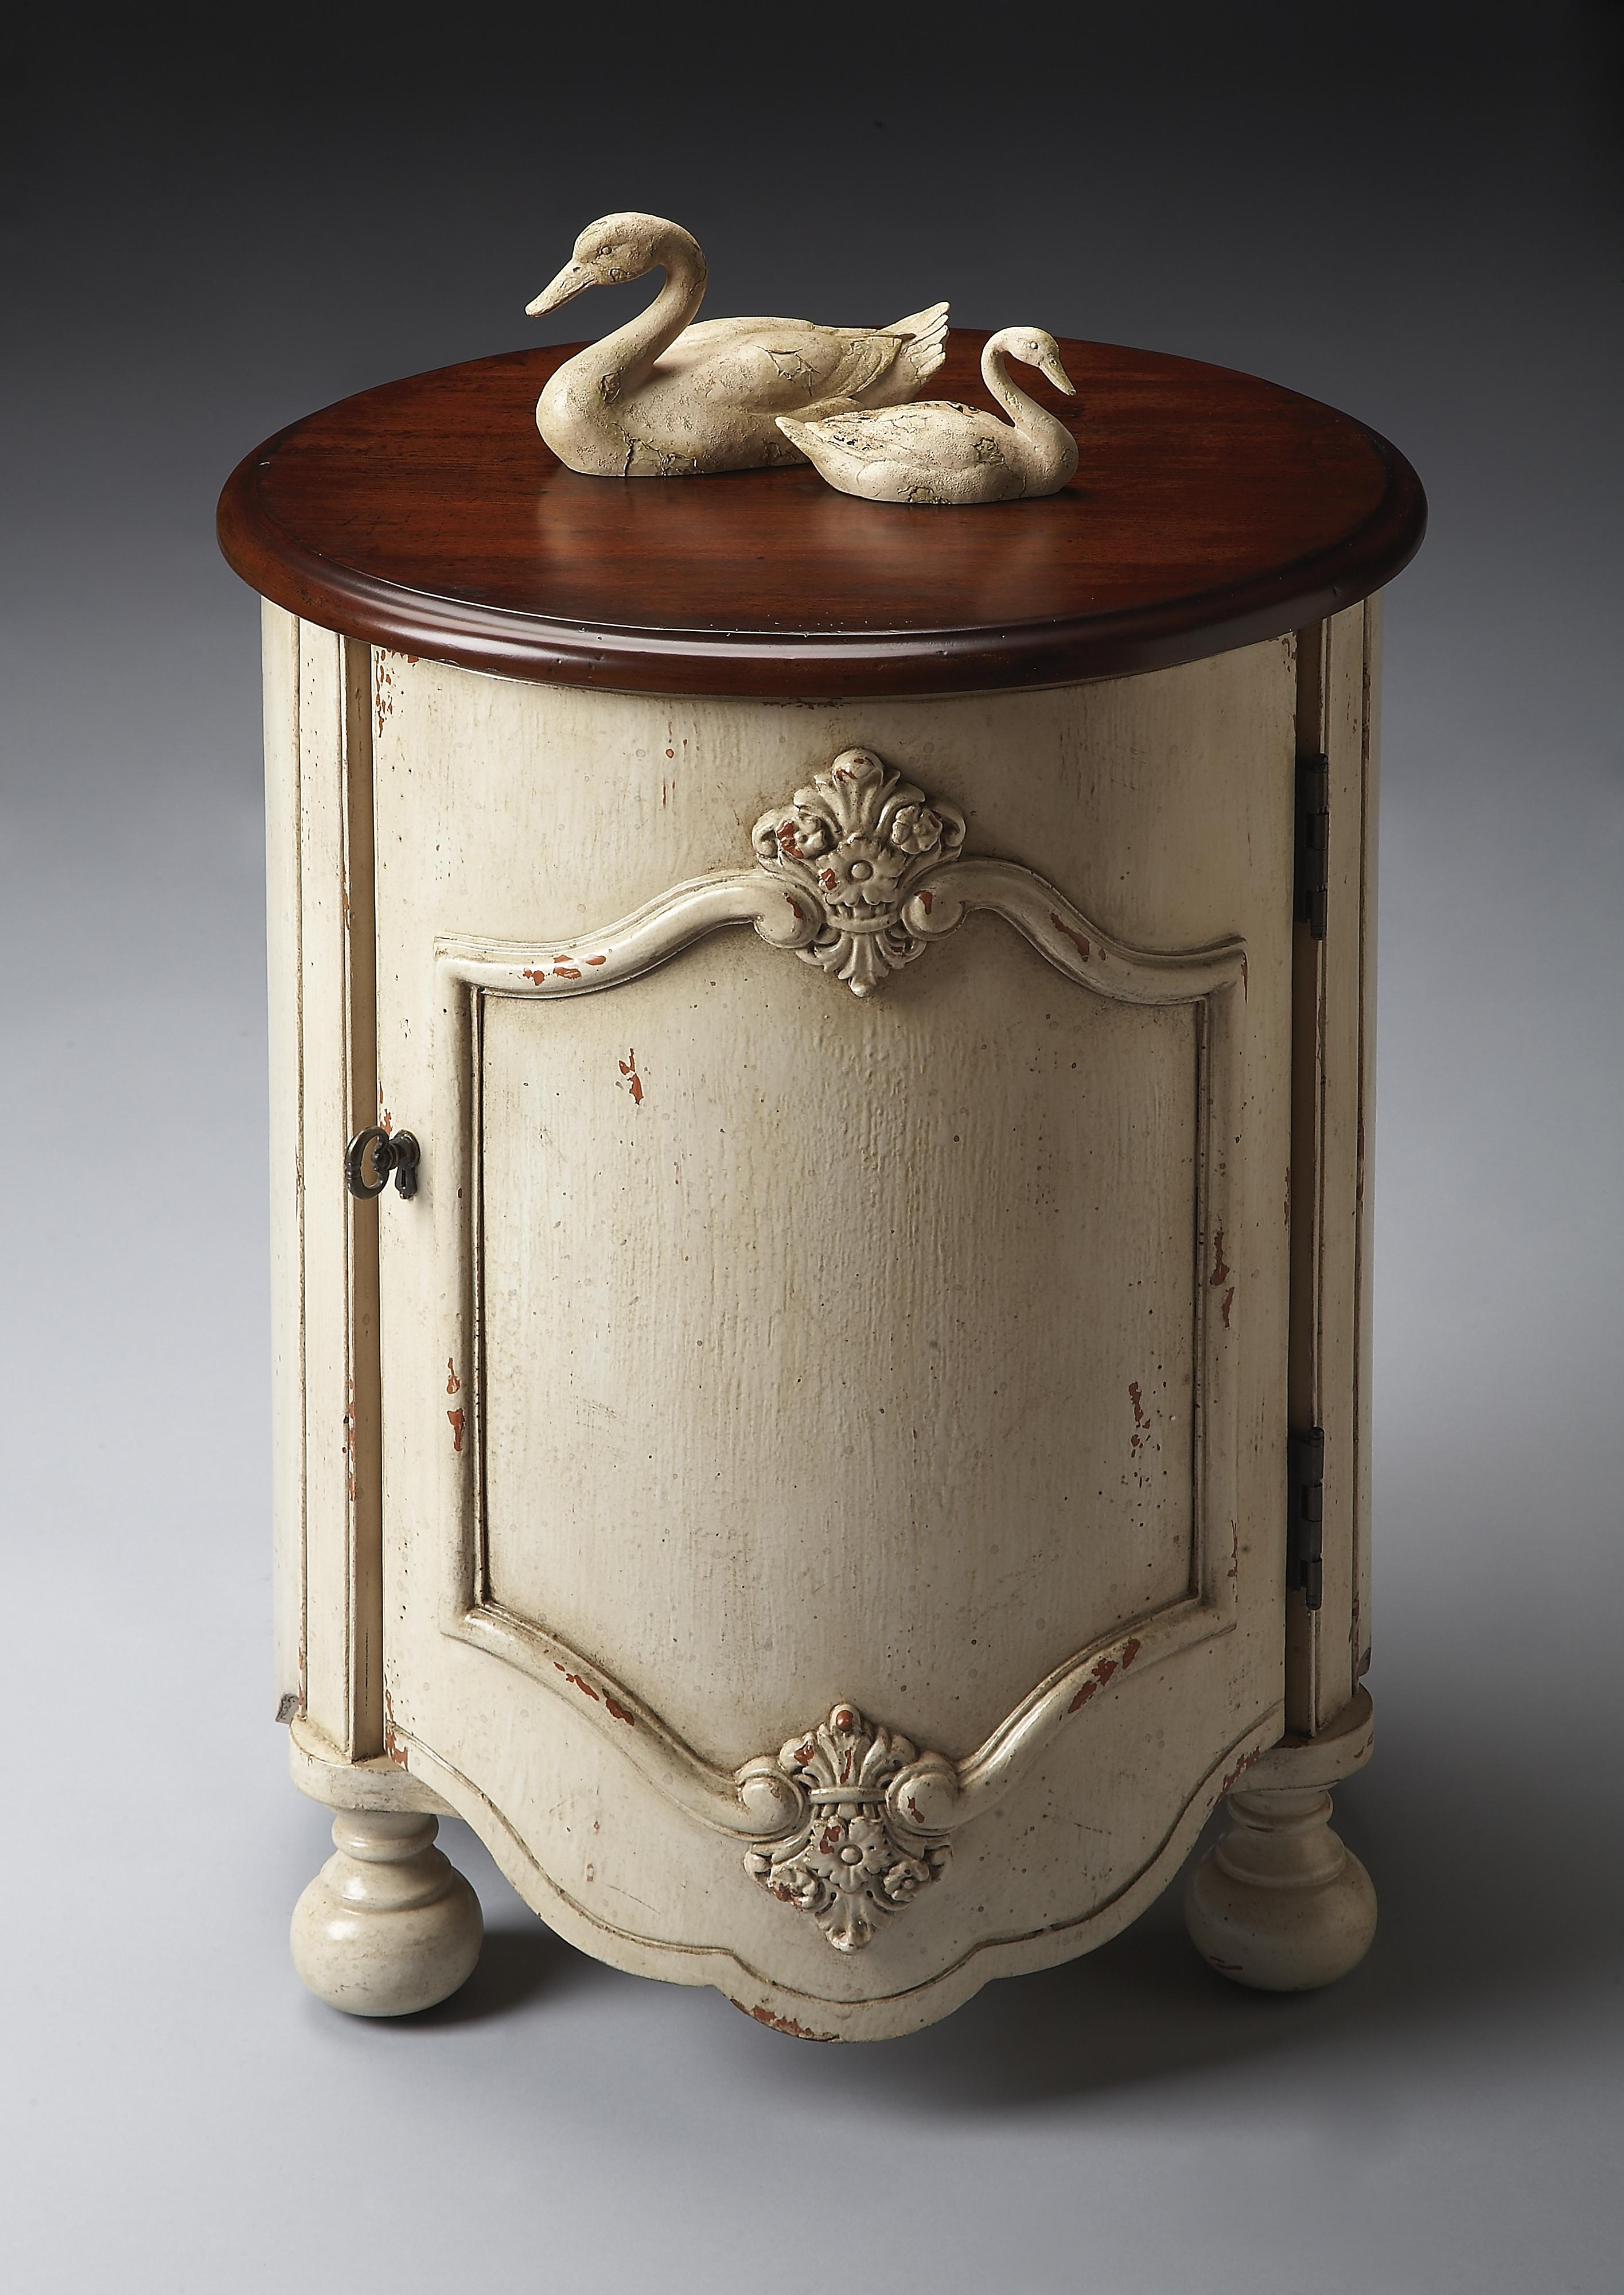 Butler Specialty Company Artist's Originals Drum Table - Item Number: 4001115